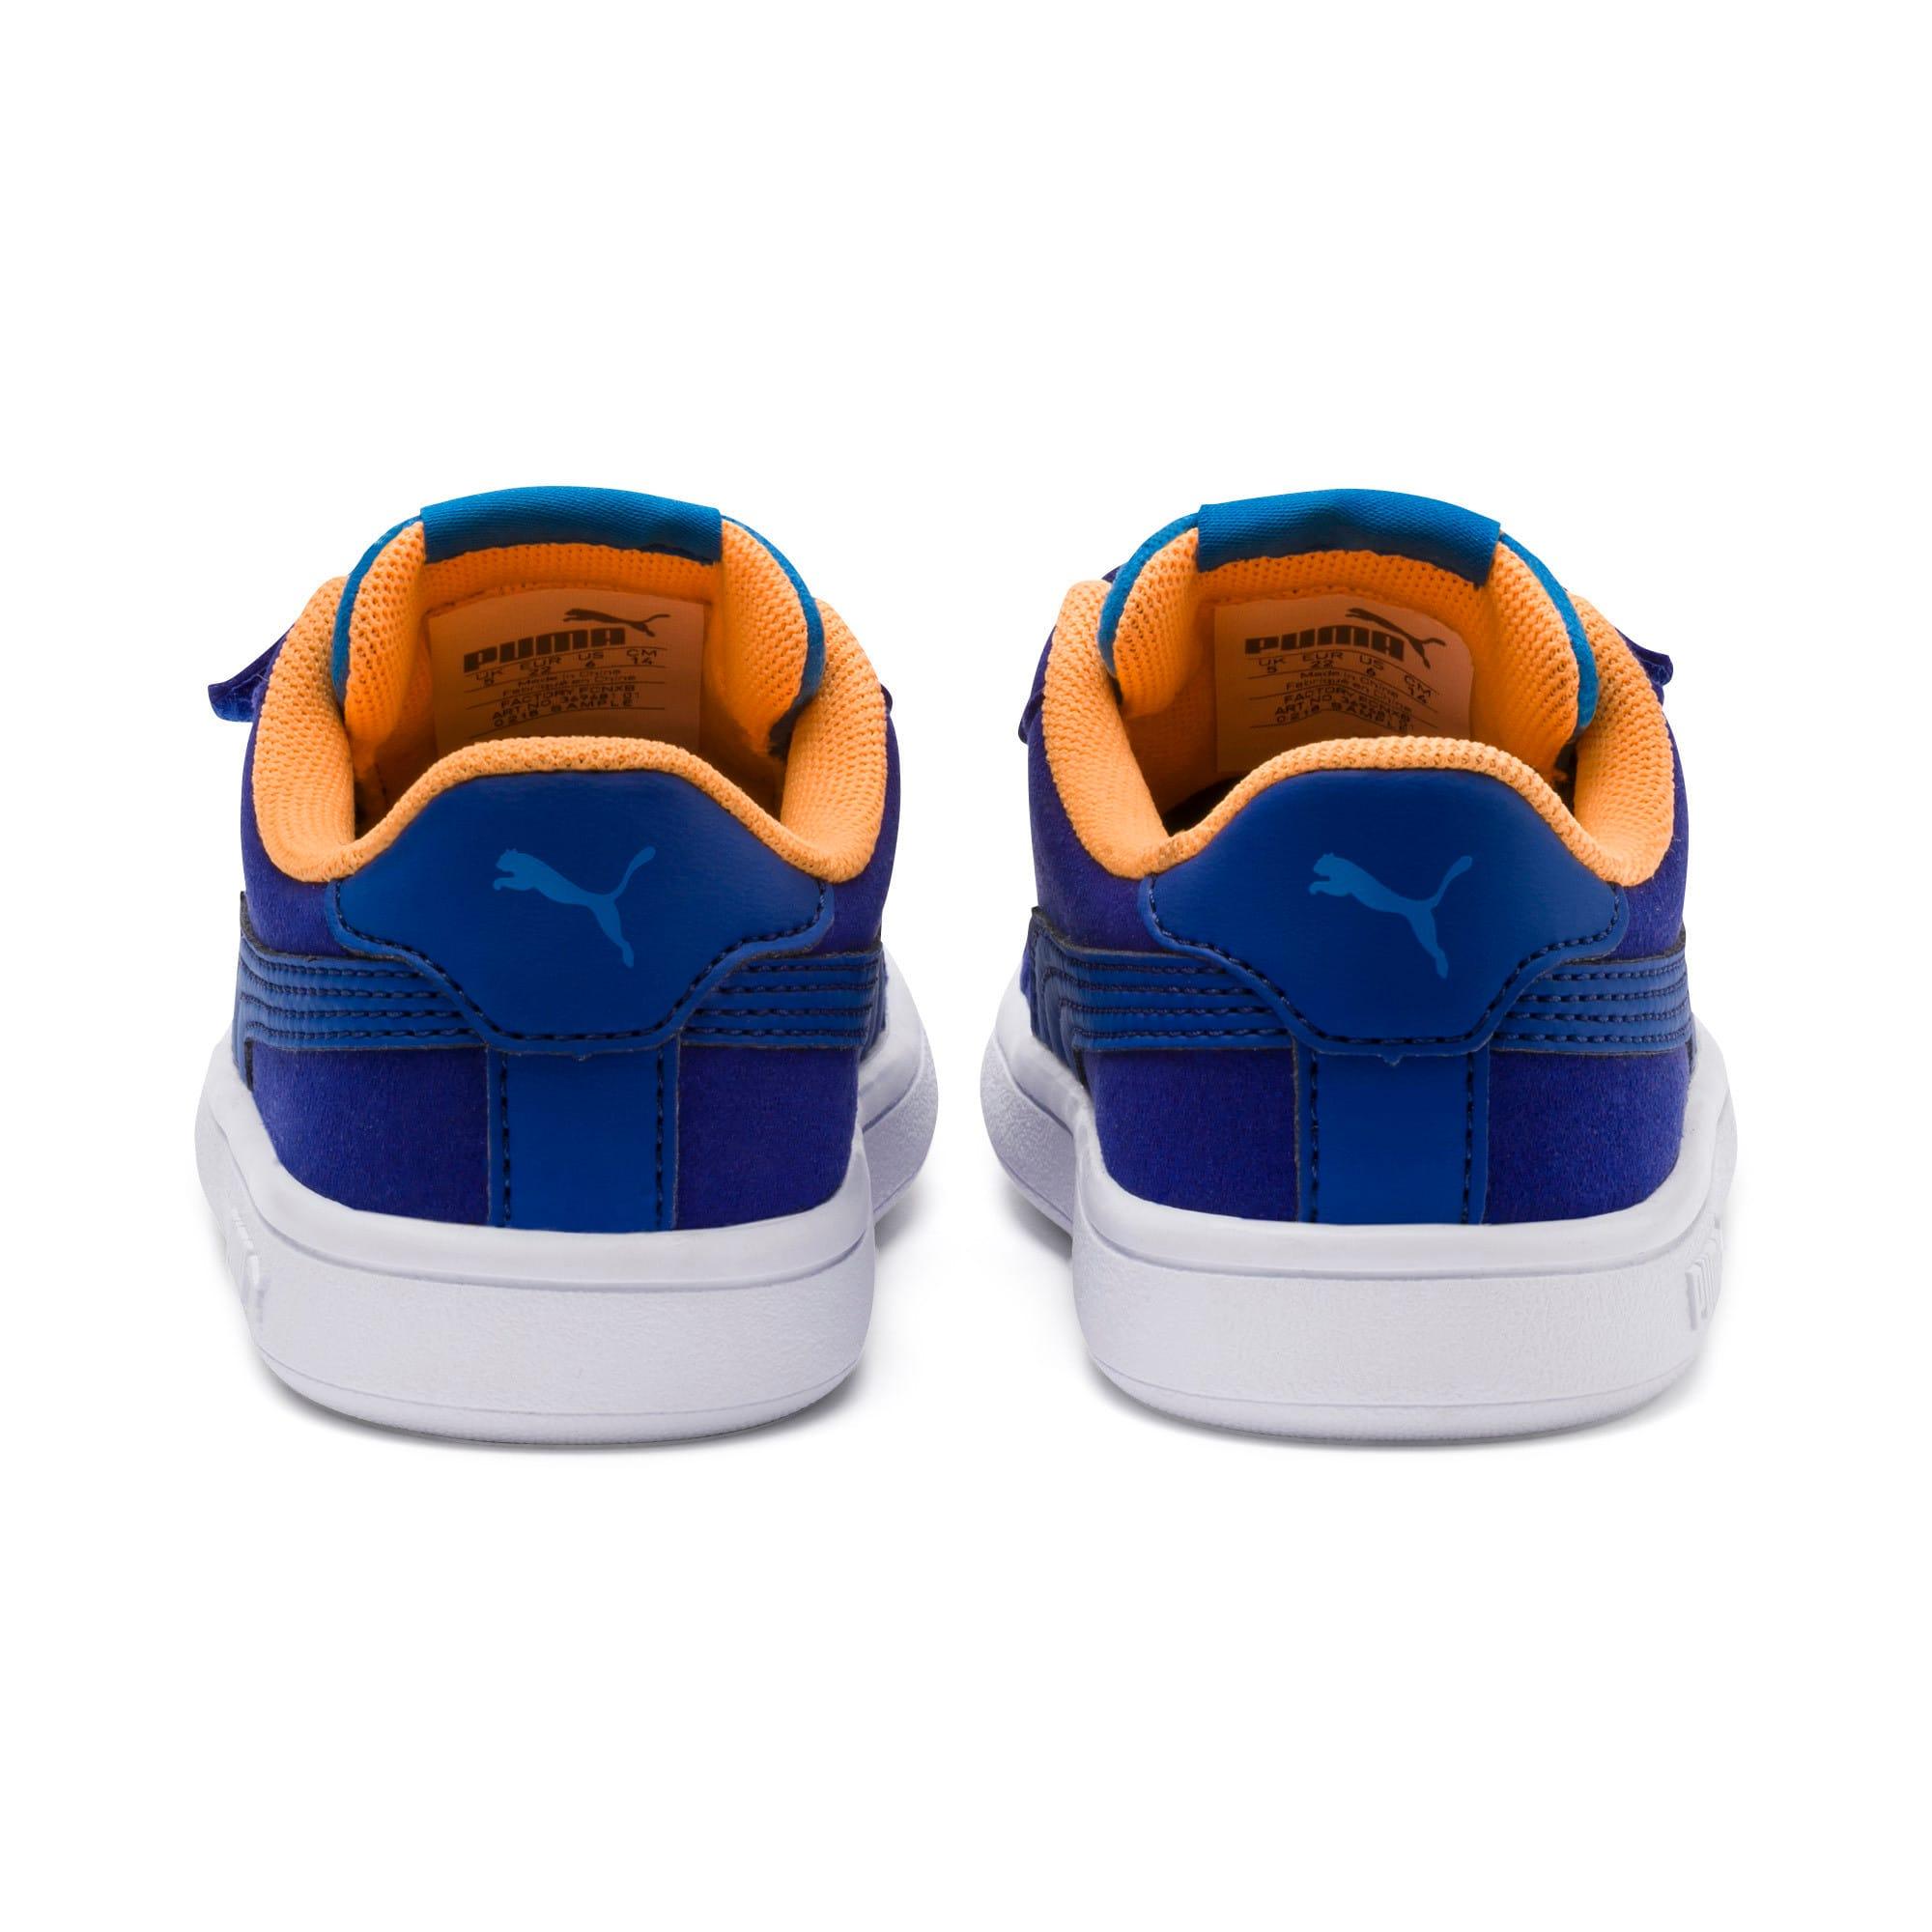 Thumbnail 3 of PUMA Smash v2 Monster Toddler Shoes, Sf Th Wb-I Bunting-Ornge-Wht, medium